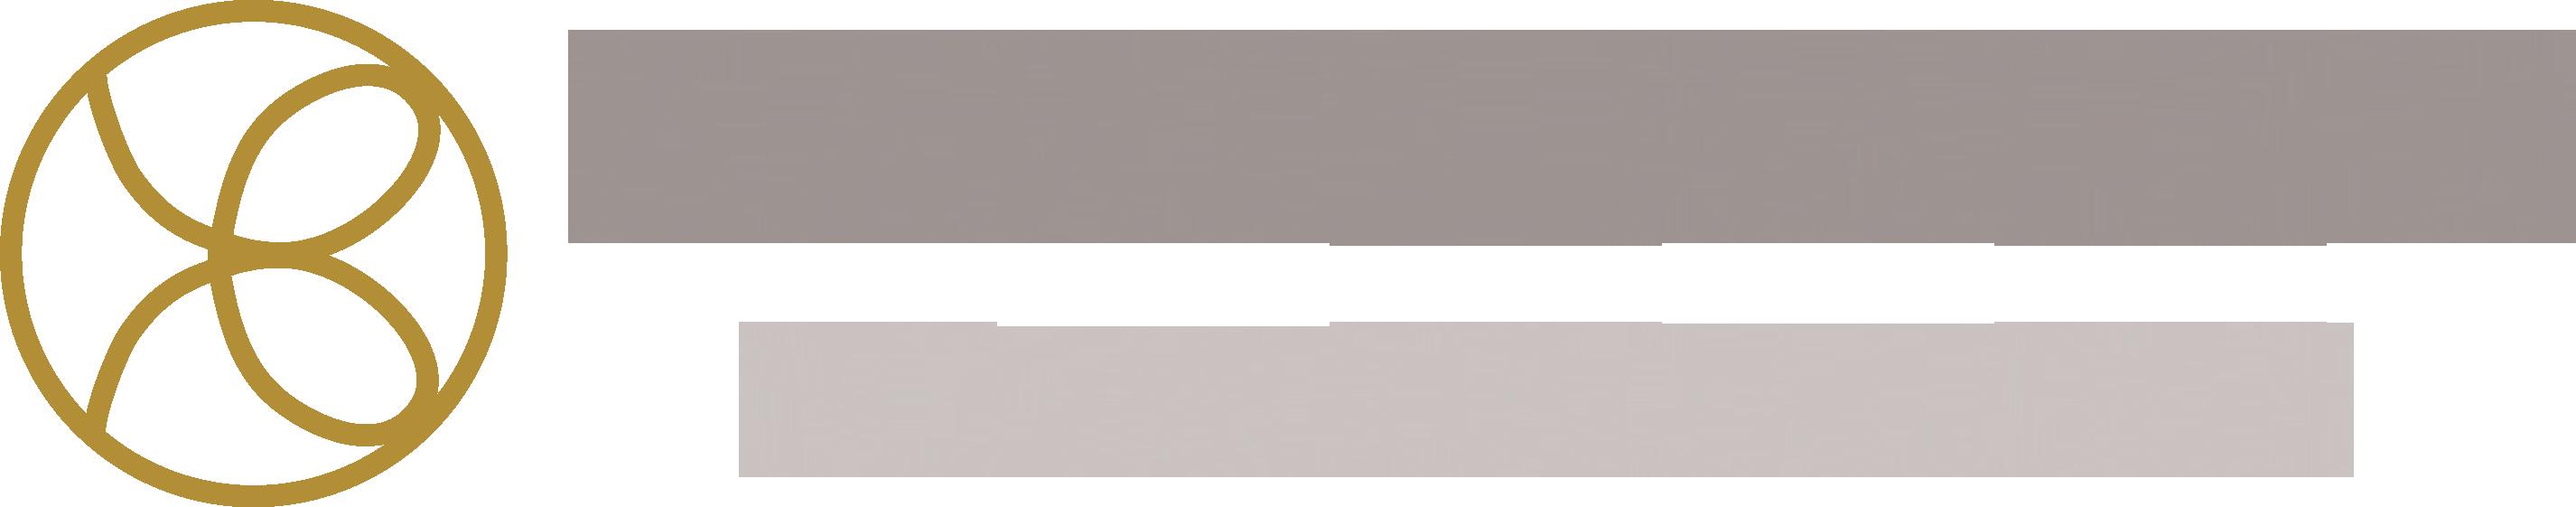 Karin Bauer Schmuckkalerie